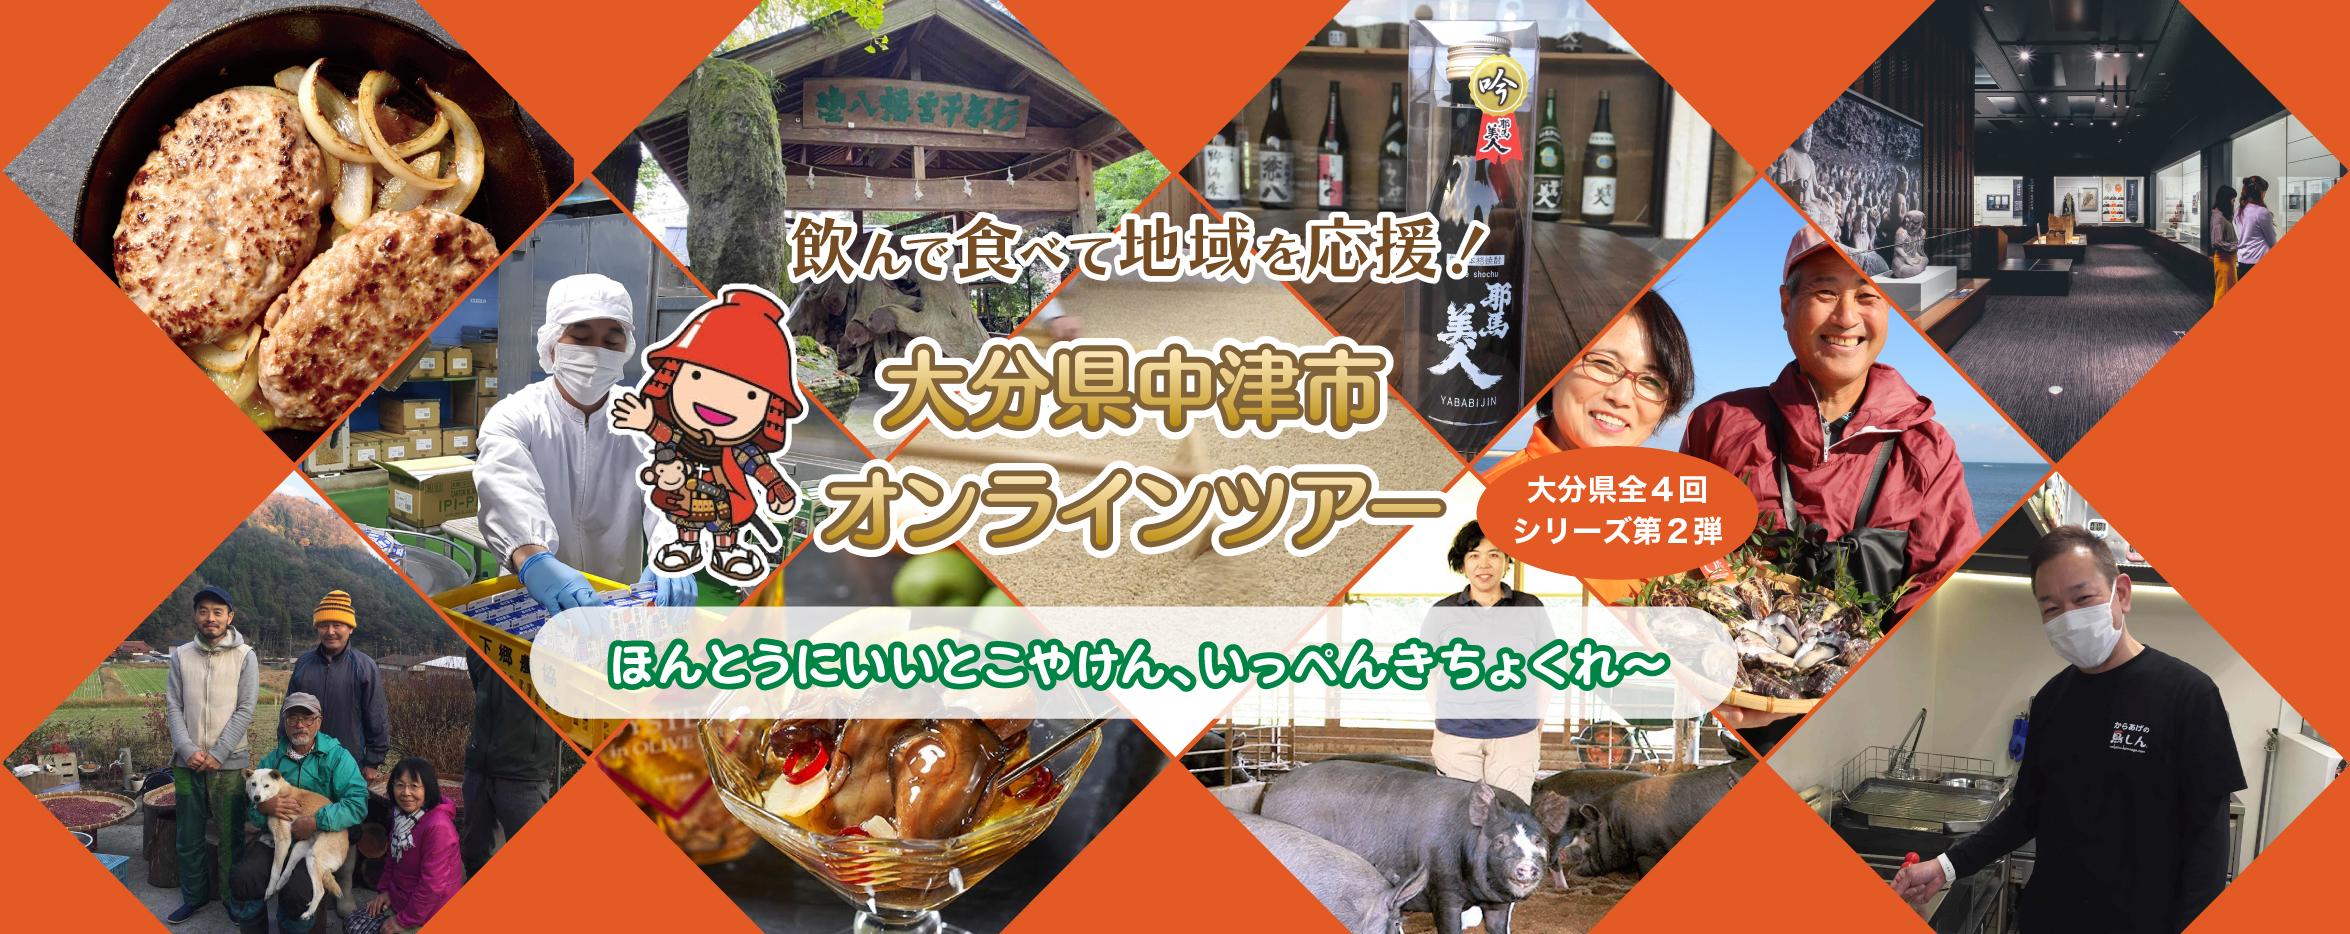 autabi_ohtsu_tour_main_img01_201217